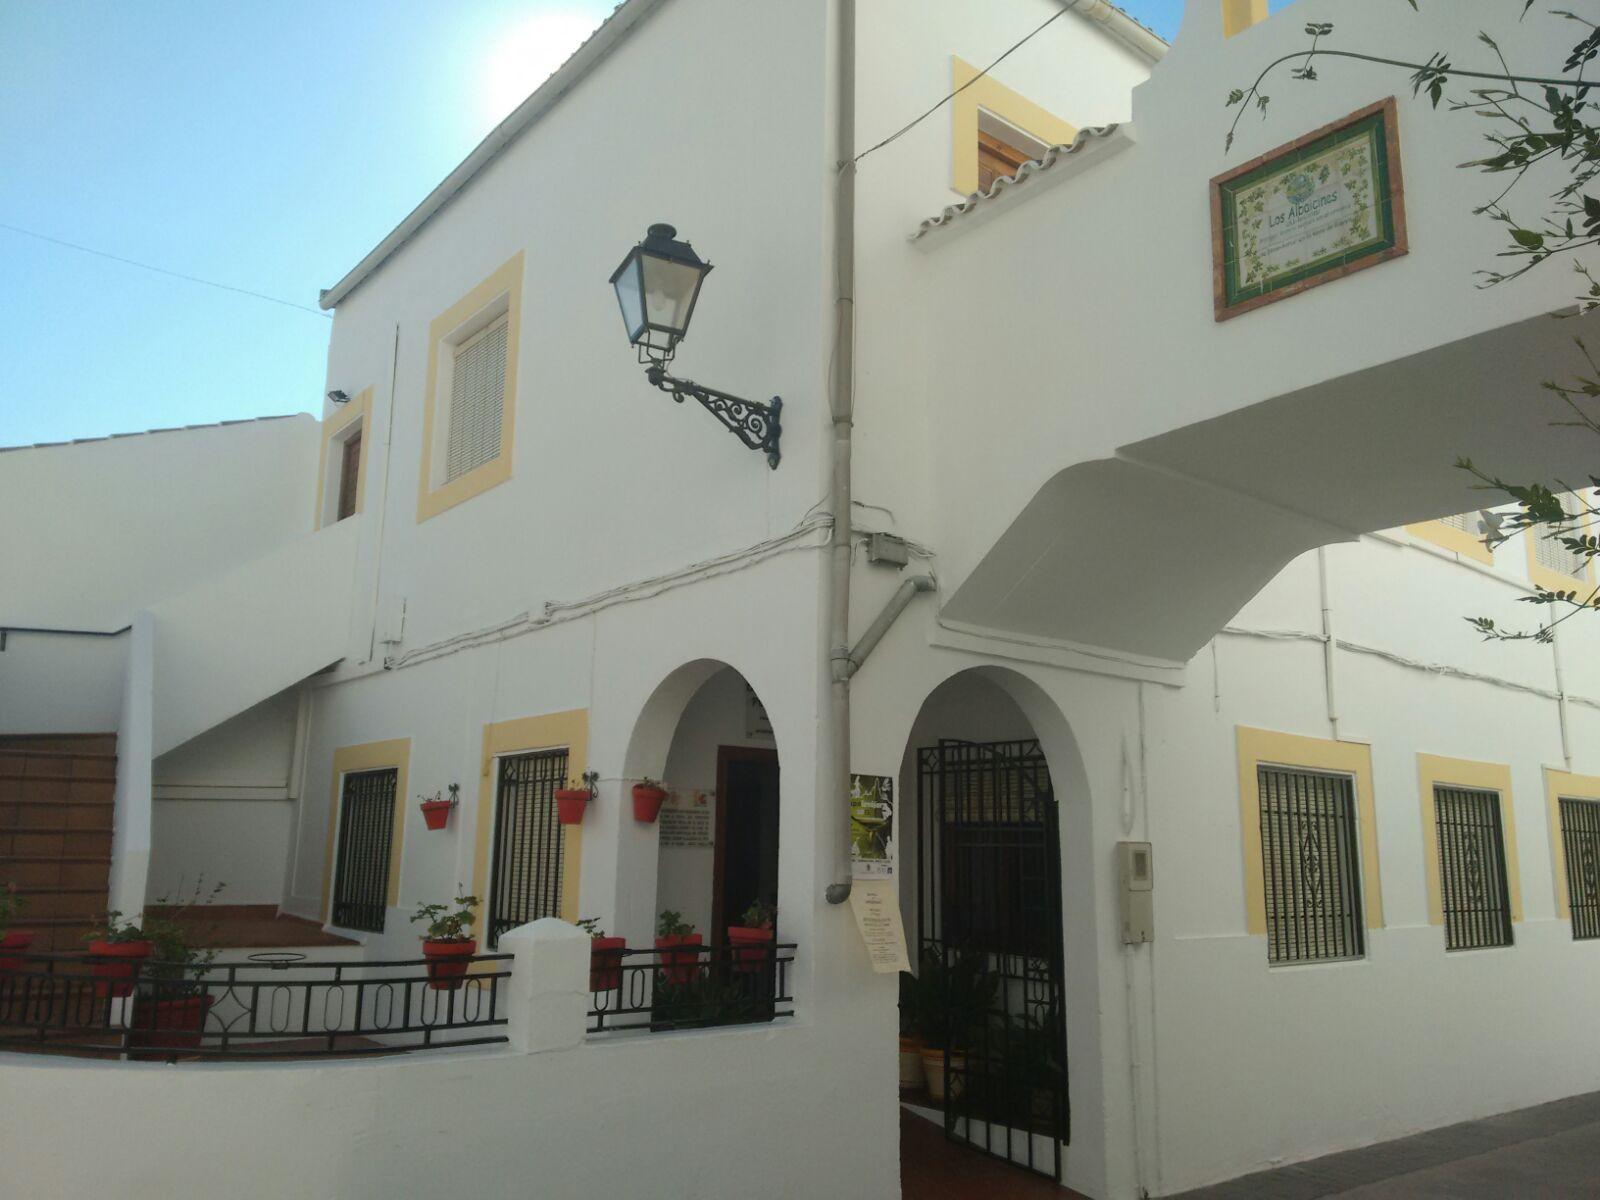 Edificio del Centro social polivalente